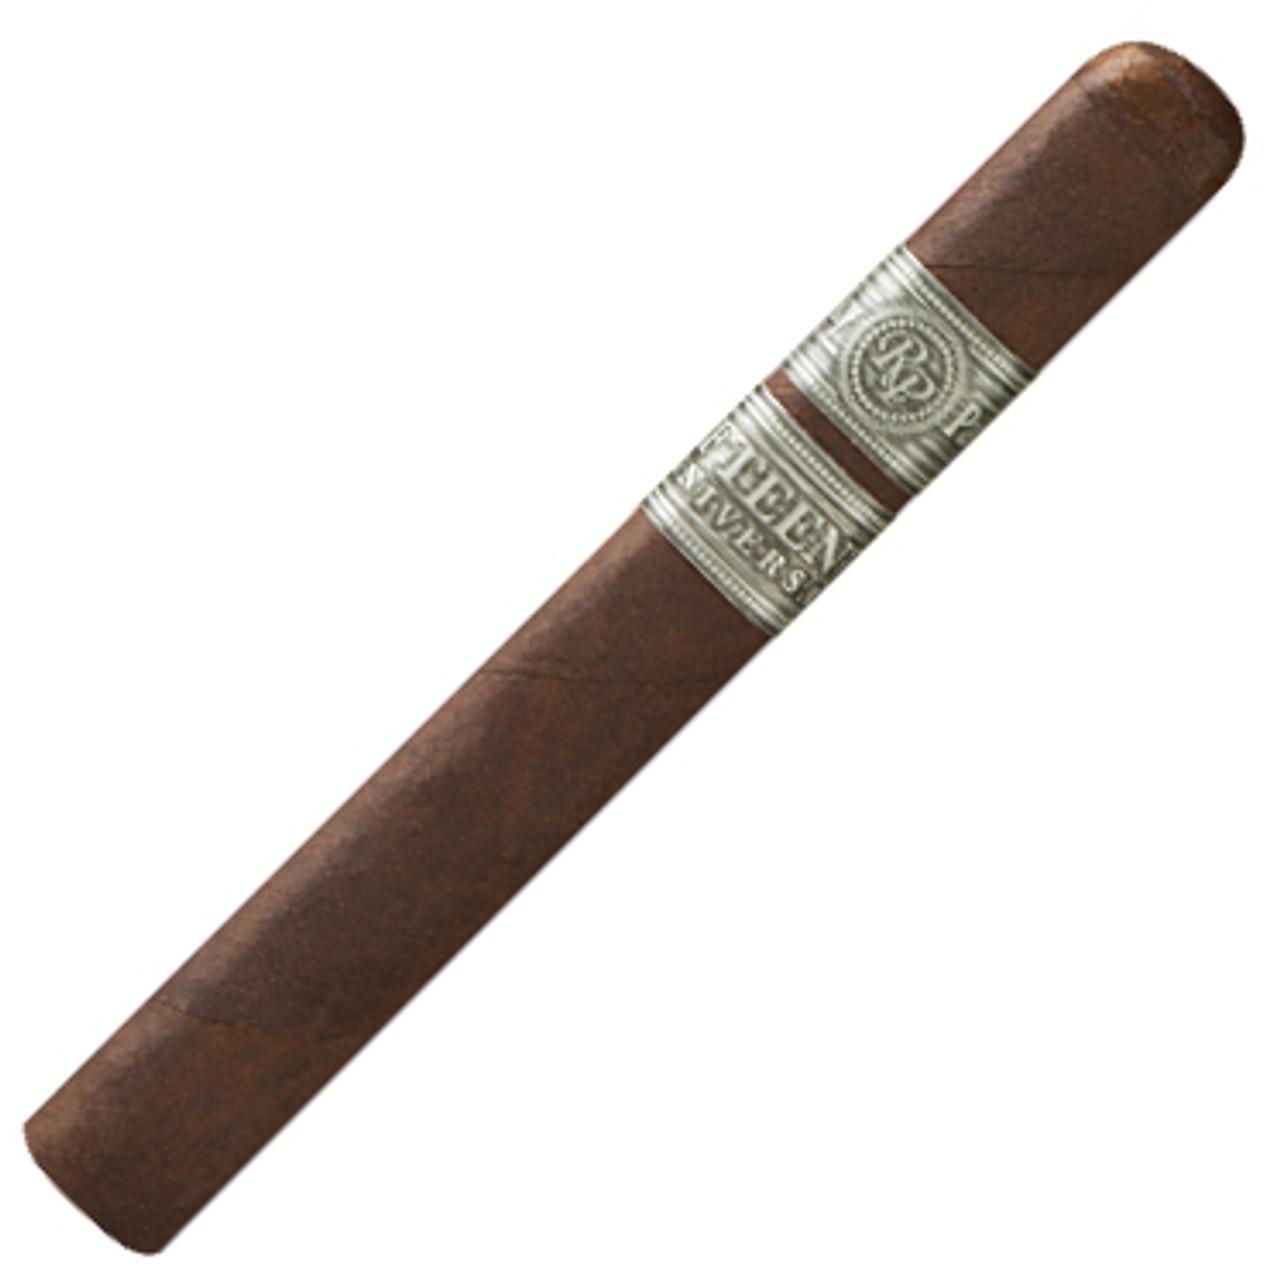 Rocky Patel 15th Anniversary Toro Cigars - 6.5 x 52 (Box of 20)